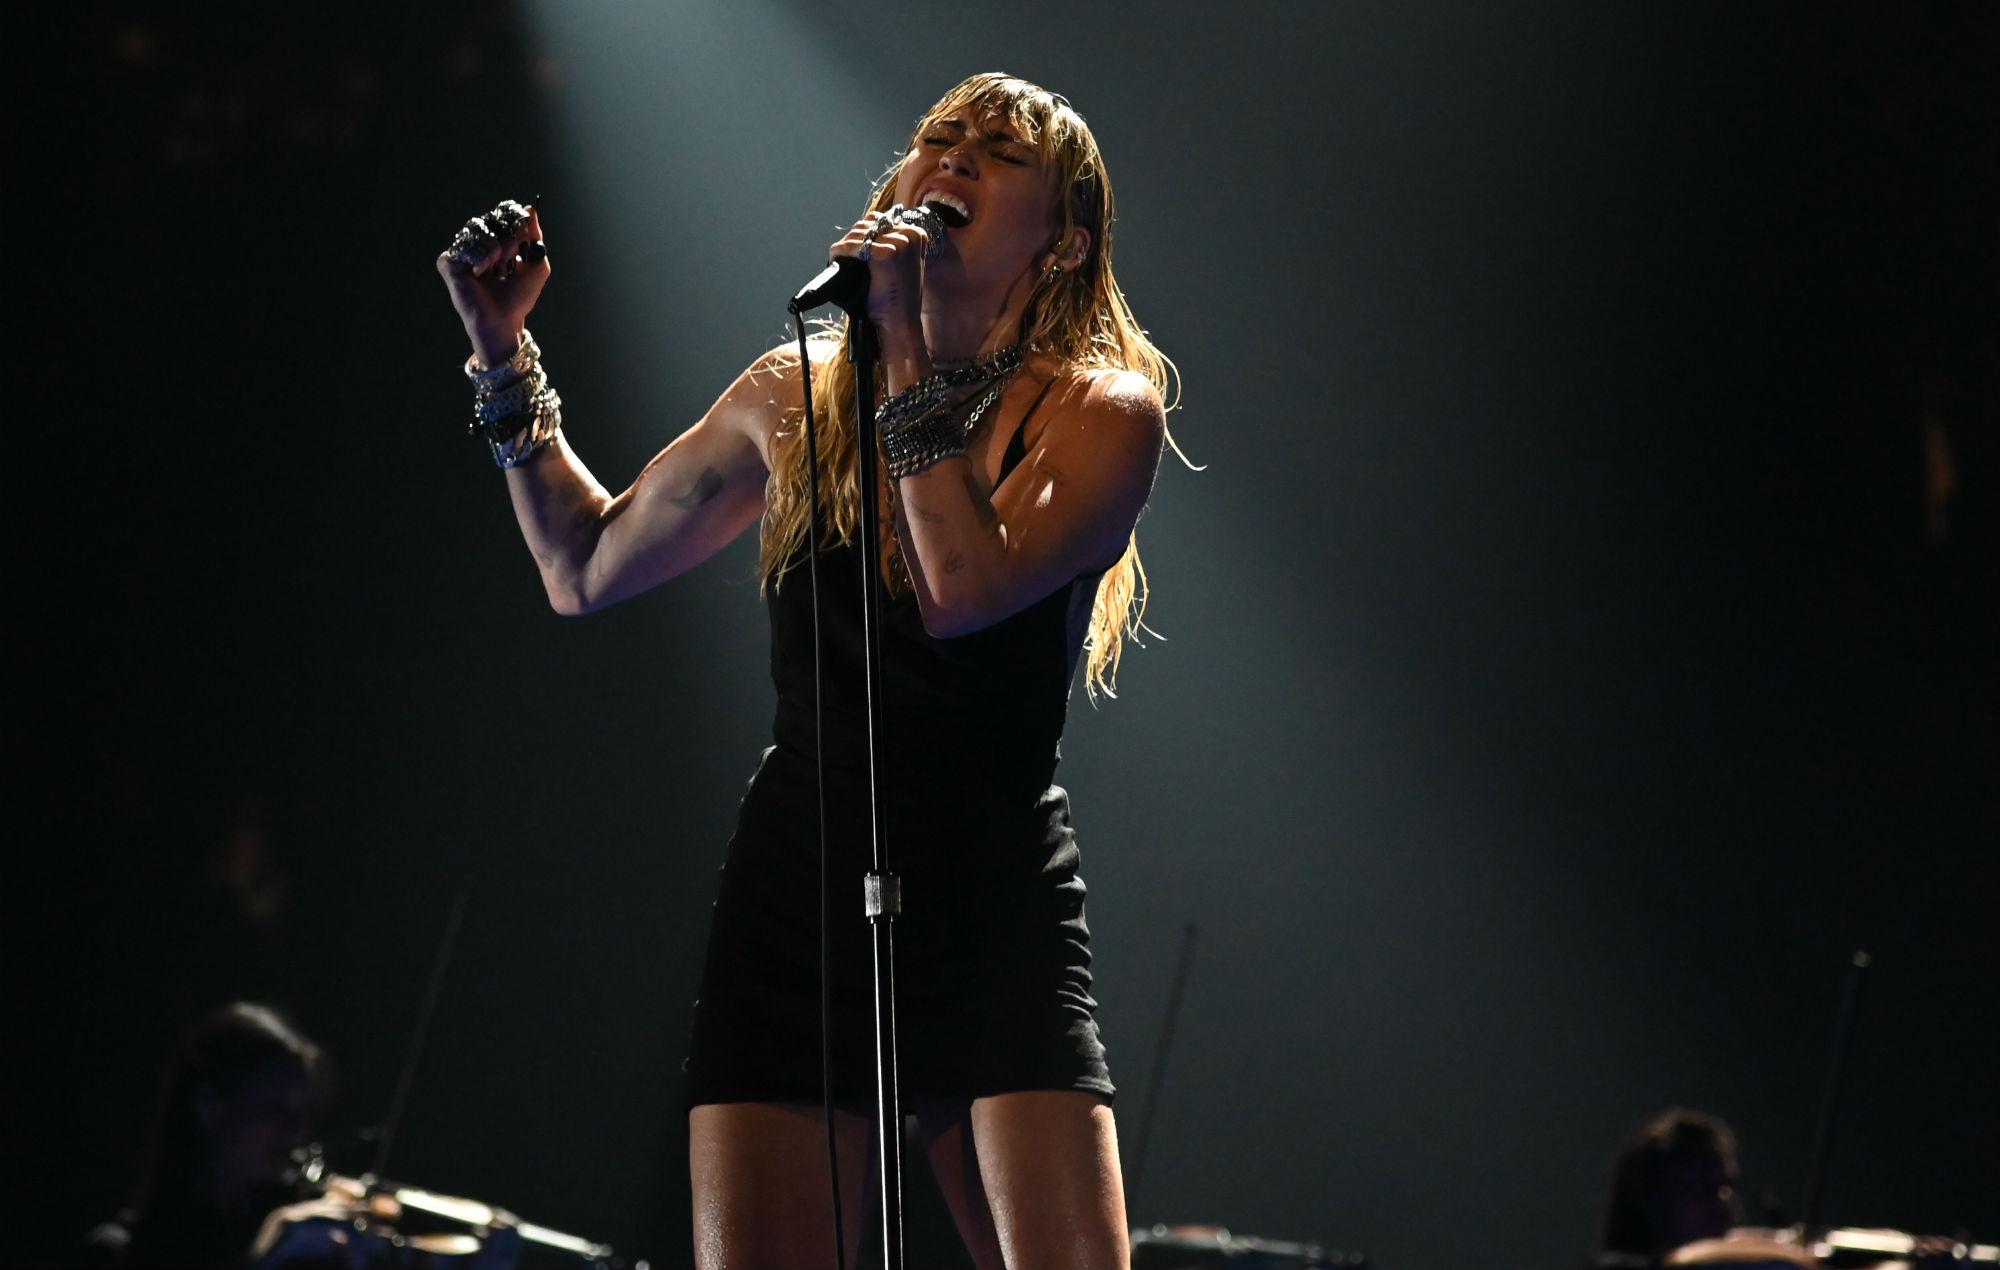 Miley Cyrus postpones recording following vocal surgery